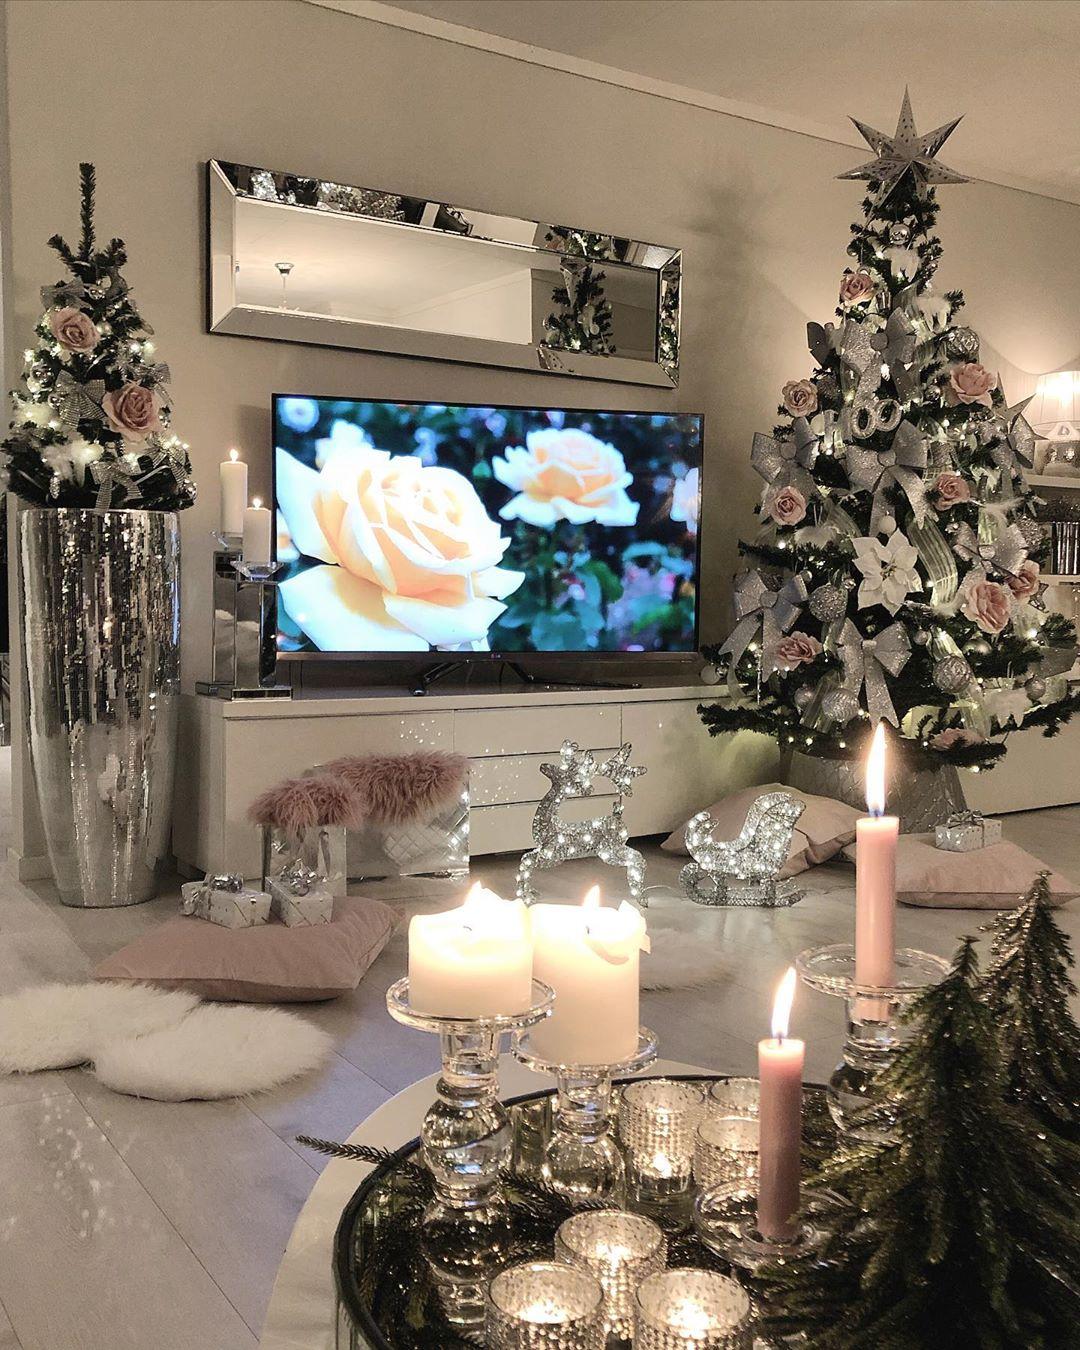 24 Nov. . O N E M O N T H L E F T. . ⭐️ Interior - Home Decor